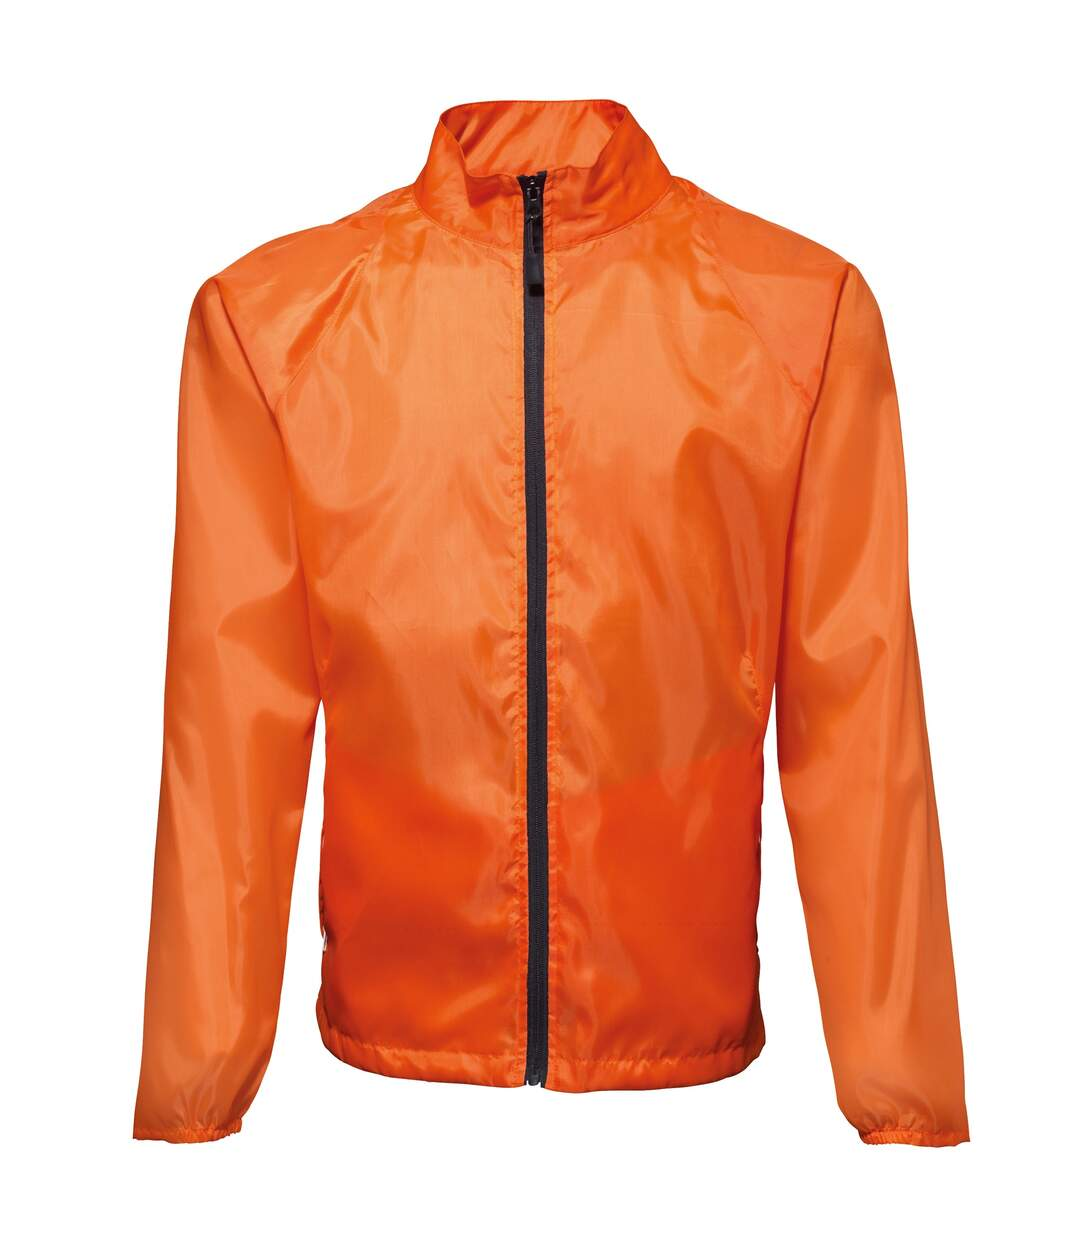 2786 Mens Contrast Lightweight Windcheater Shower Proof Jacket (Pack of 2) (Orange/ Black) - UTRW7001